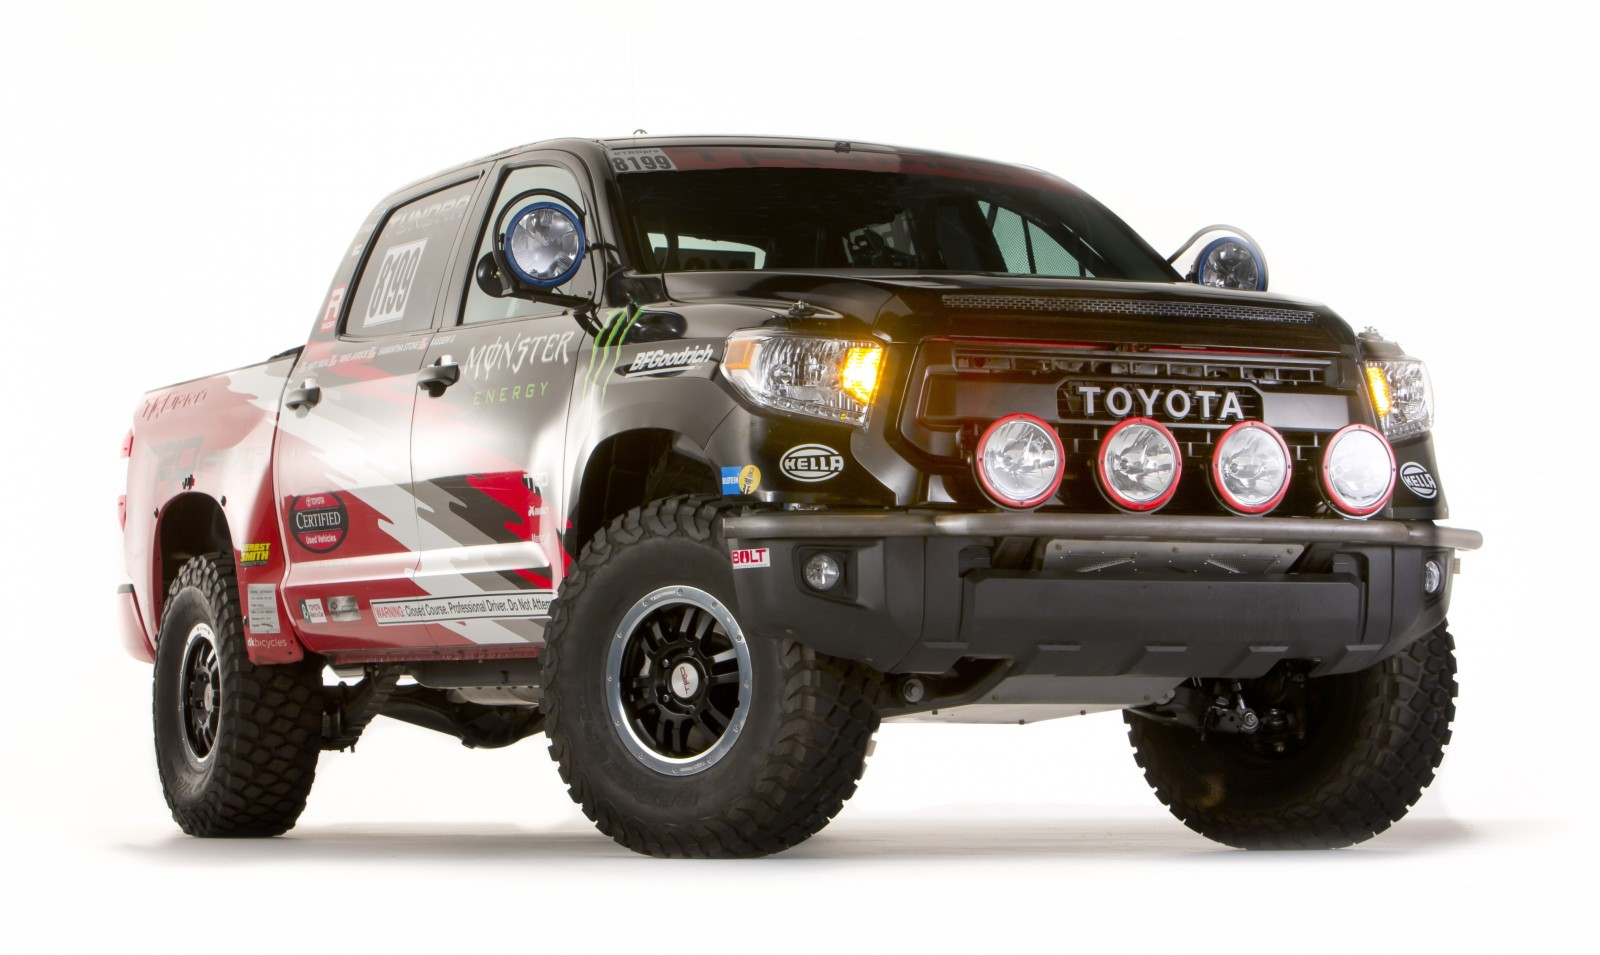 2015 Toyota Tundra TRD Pro Baja 1000 34